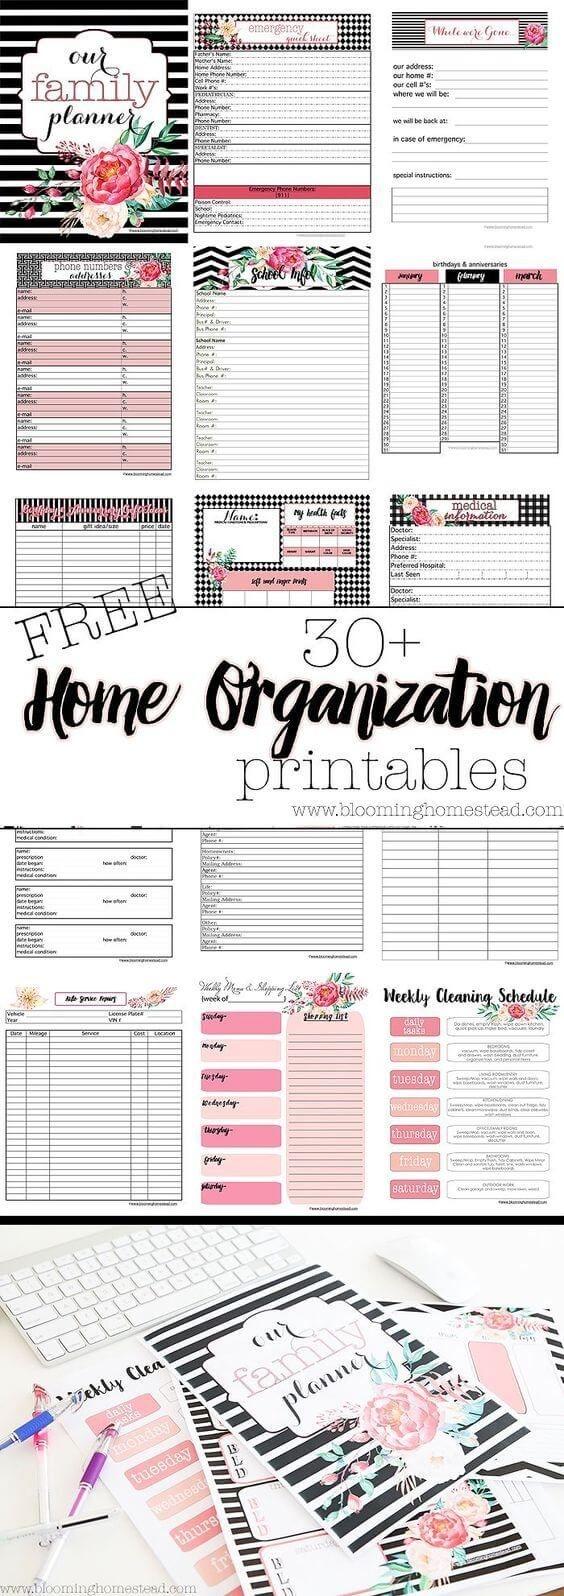 Home organization :)